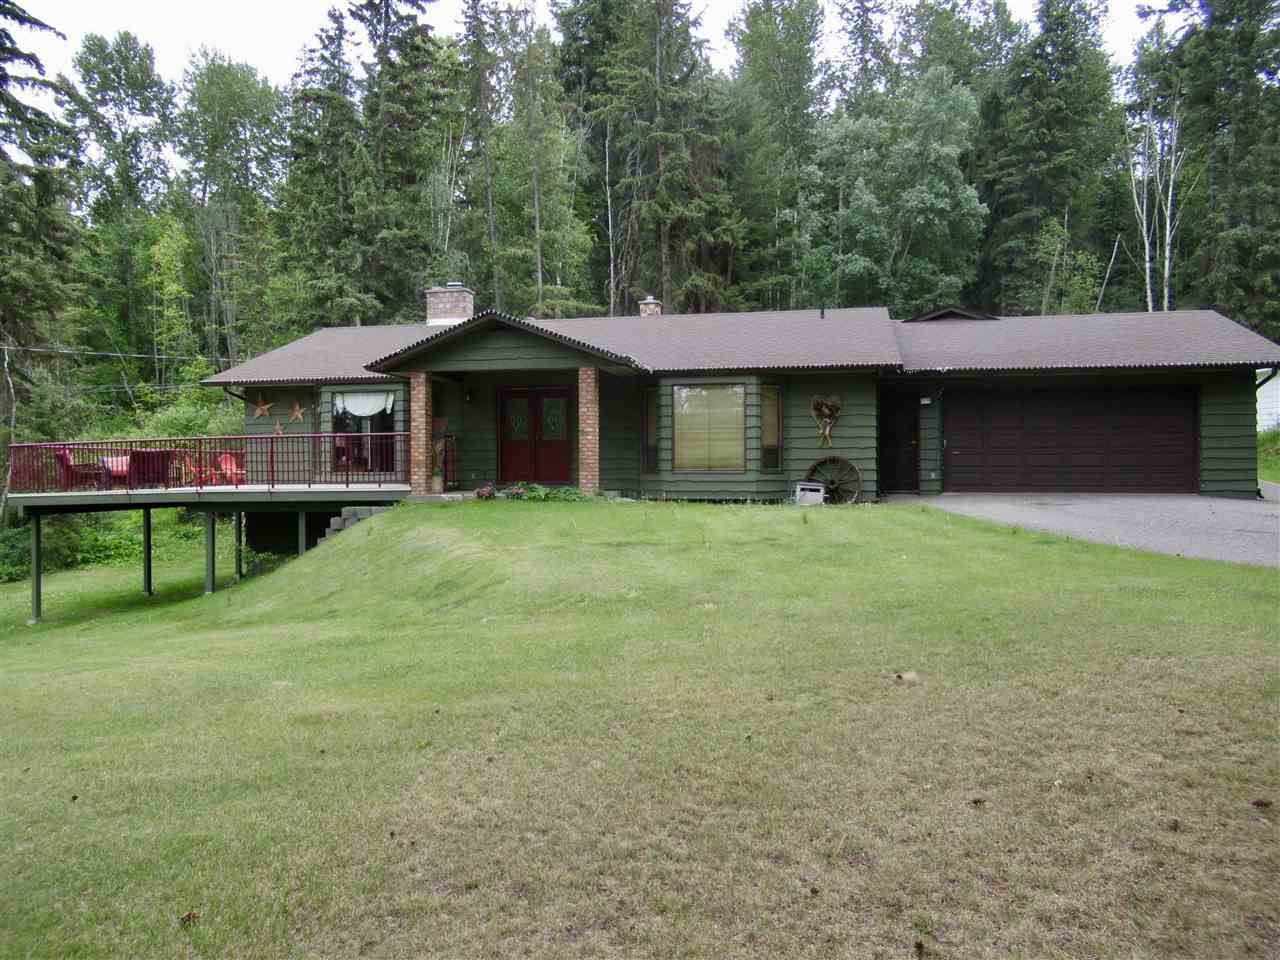 Main Photo: 911 CENTAUR Drive in Williams Lake: Esler/Dog Creek House for sale (Williams Lake (Zone 27))  : MLS®# R2378444